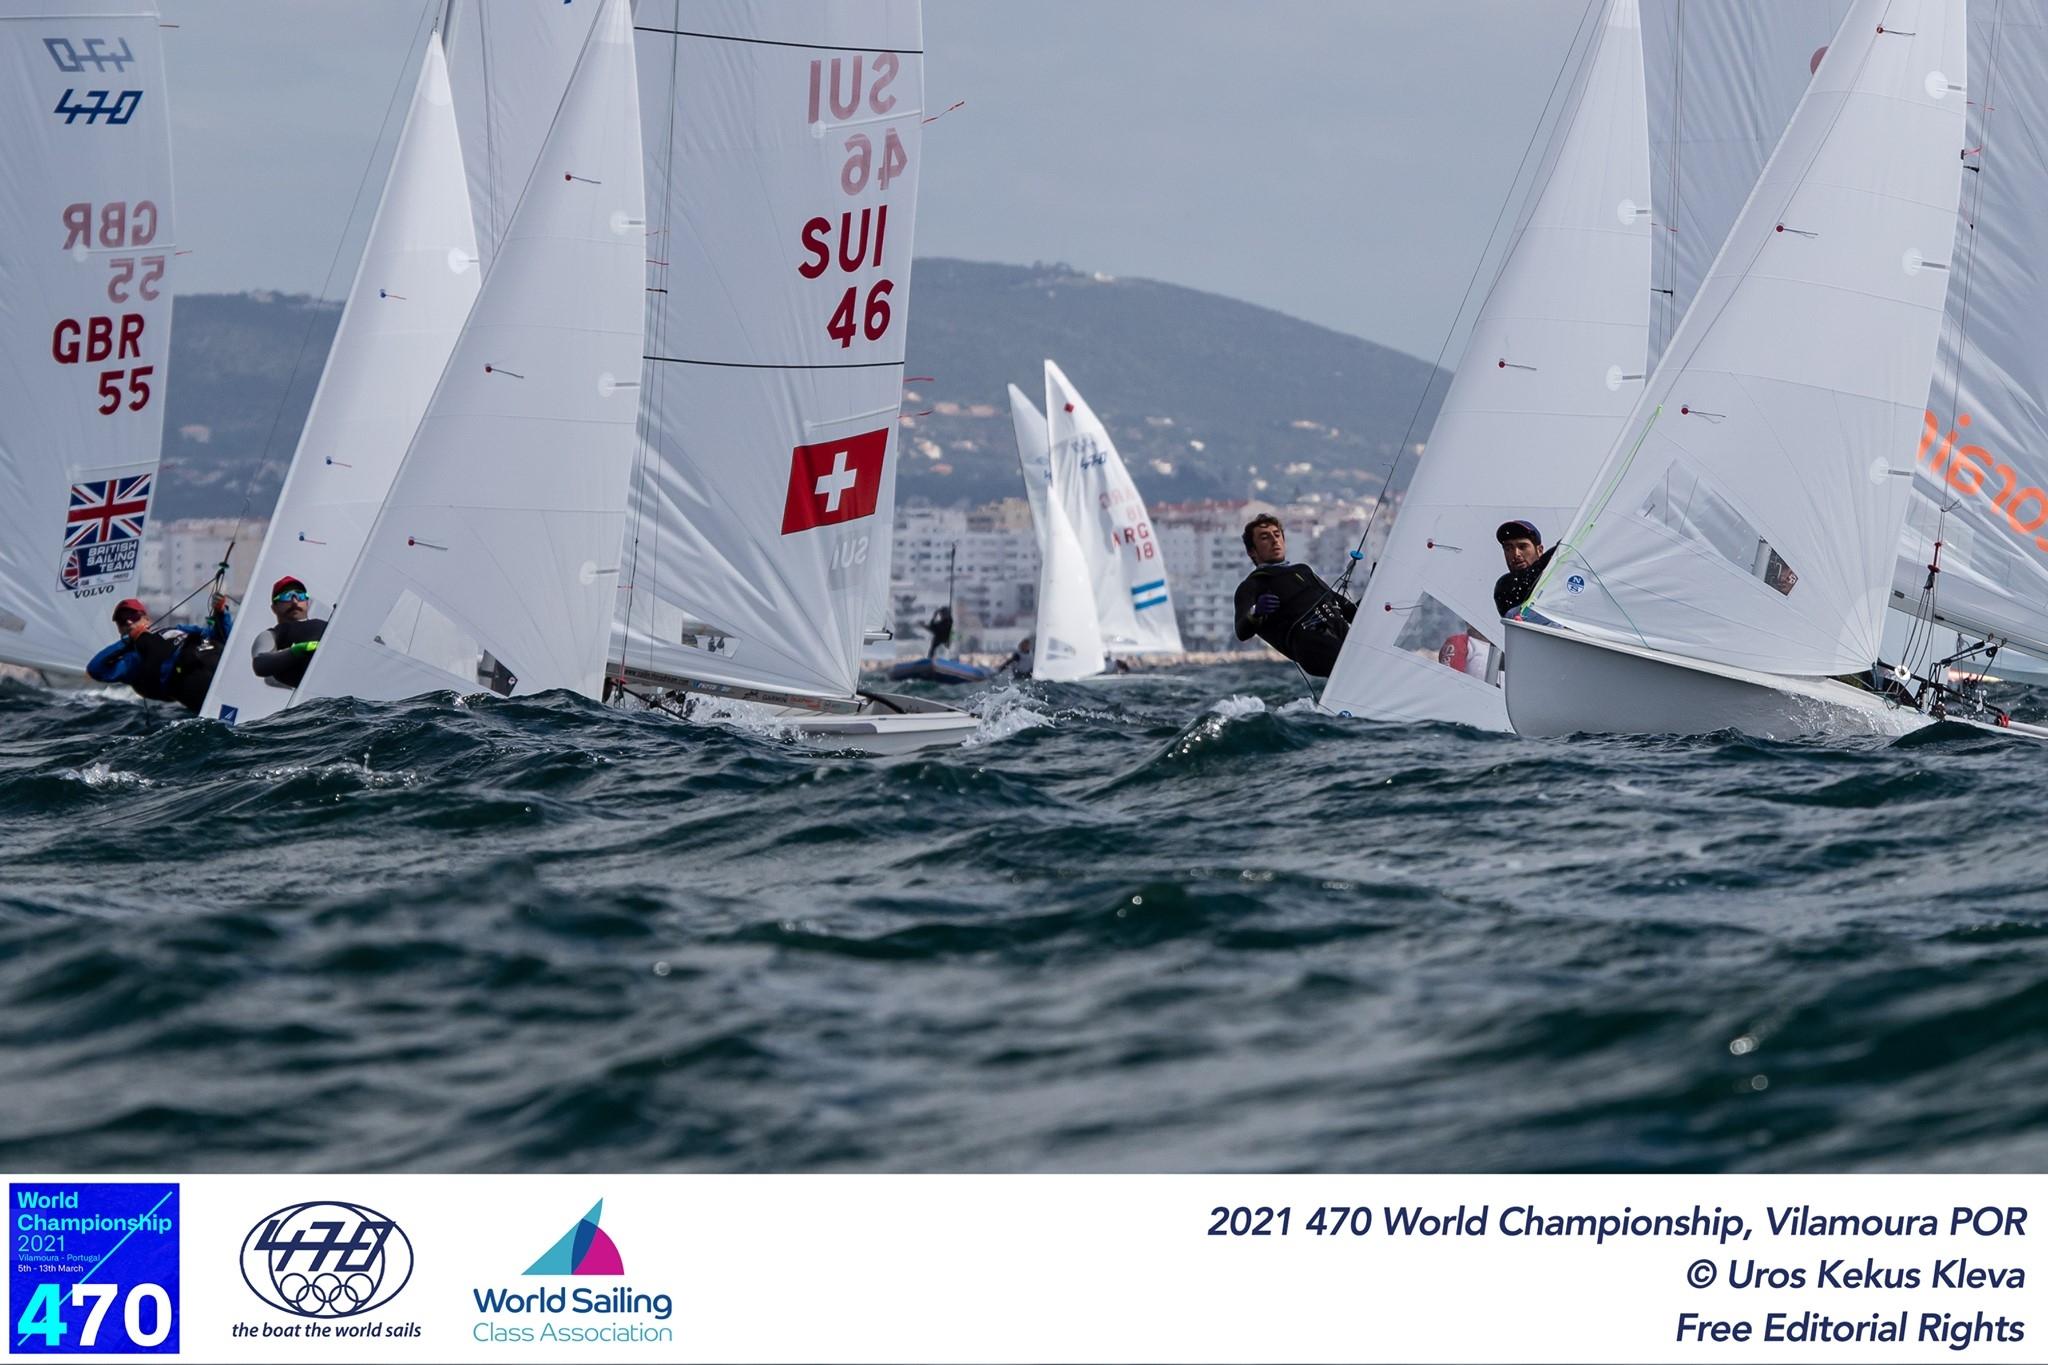 470 - World Championship 2021 - Vilamoura POR - Day 1